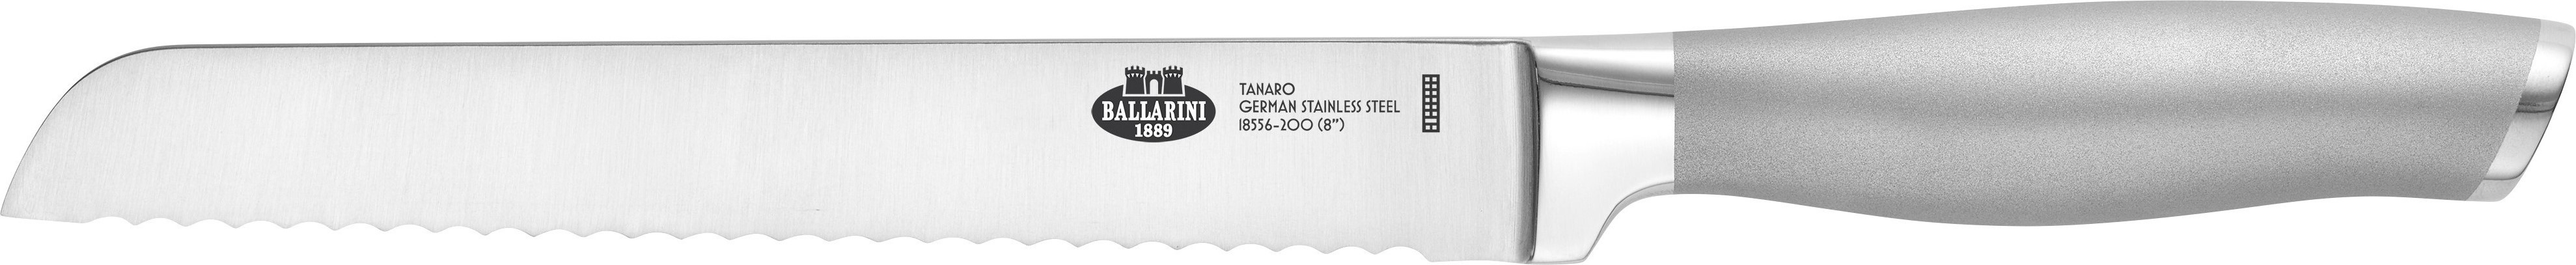 Buy the Ballarini Tanaro Serrated Bread Knife online at smithsofloughton.com